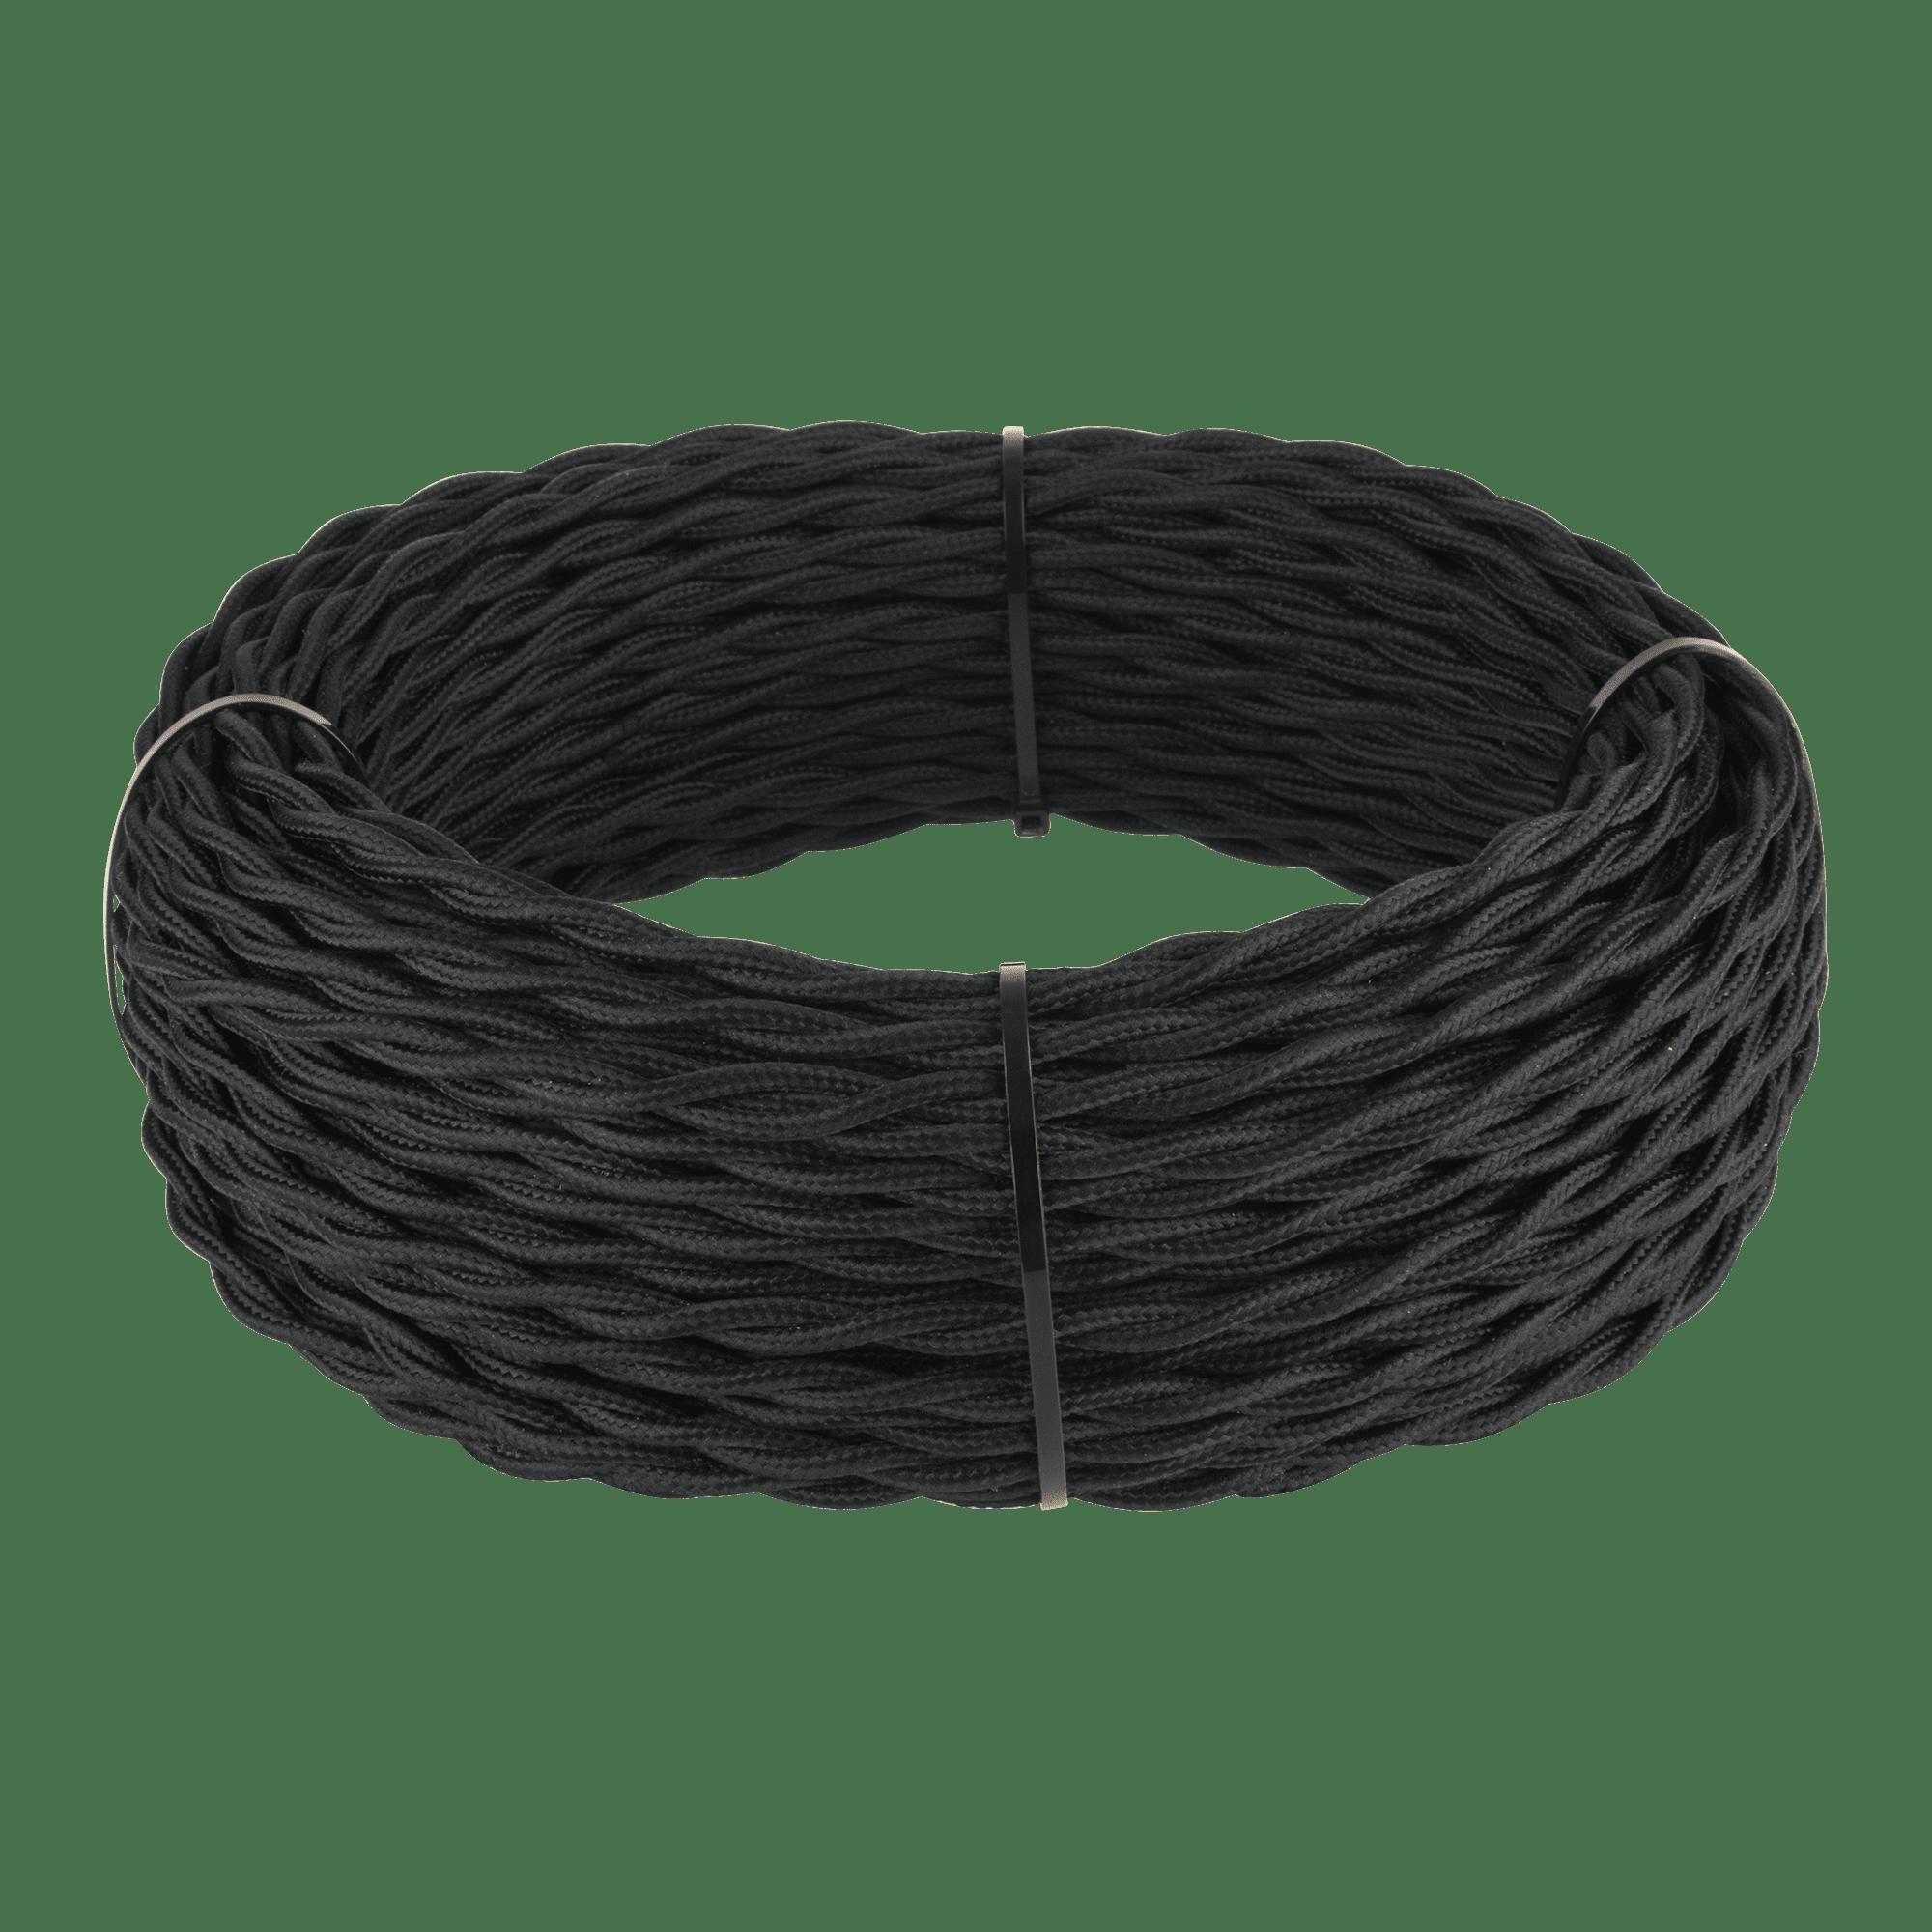 Ретро кабель витой 3х2,5 (черный) 50 м W6453608